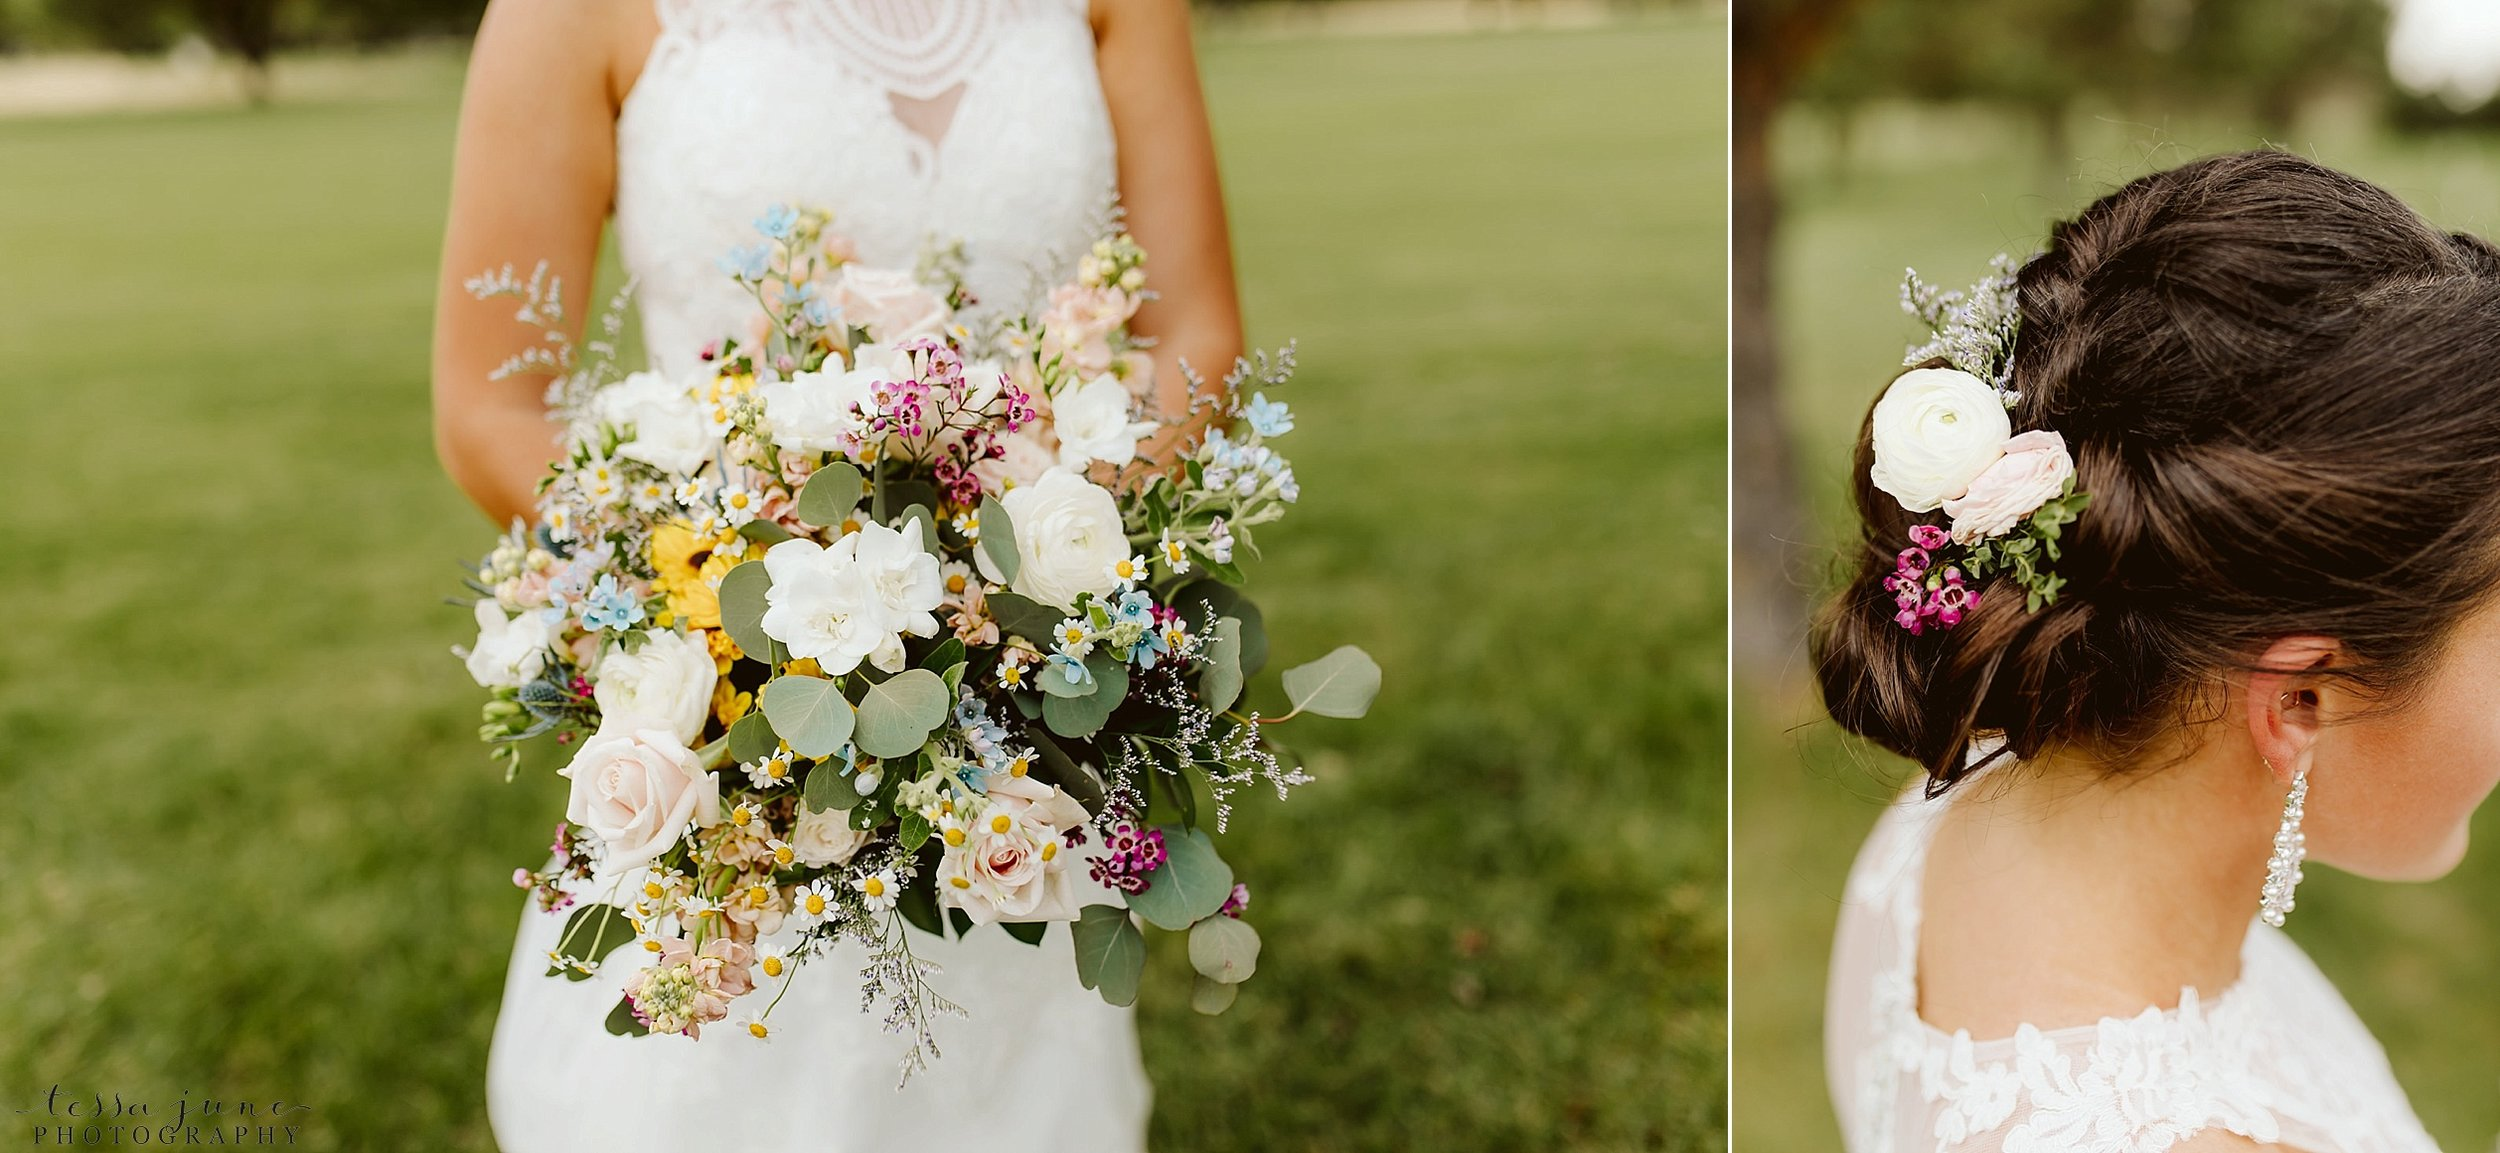 The-grands-at-mulligans-wedding-sartell-minnesota-spring-floral-spring-garden-wedding-124.jpg